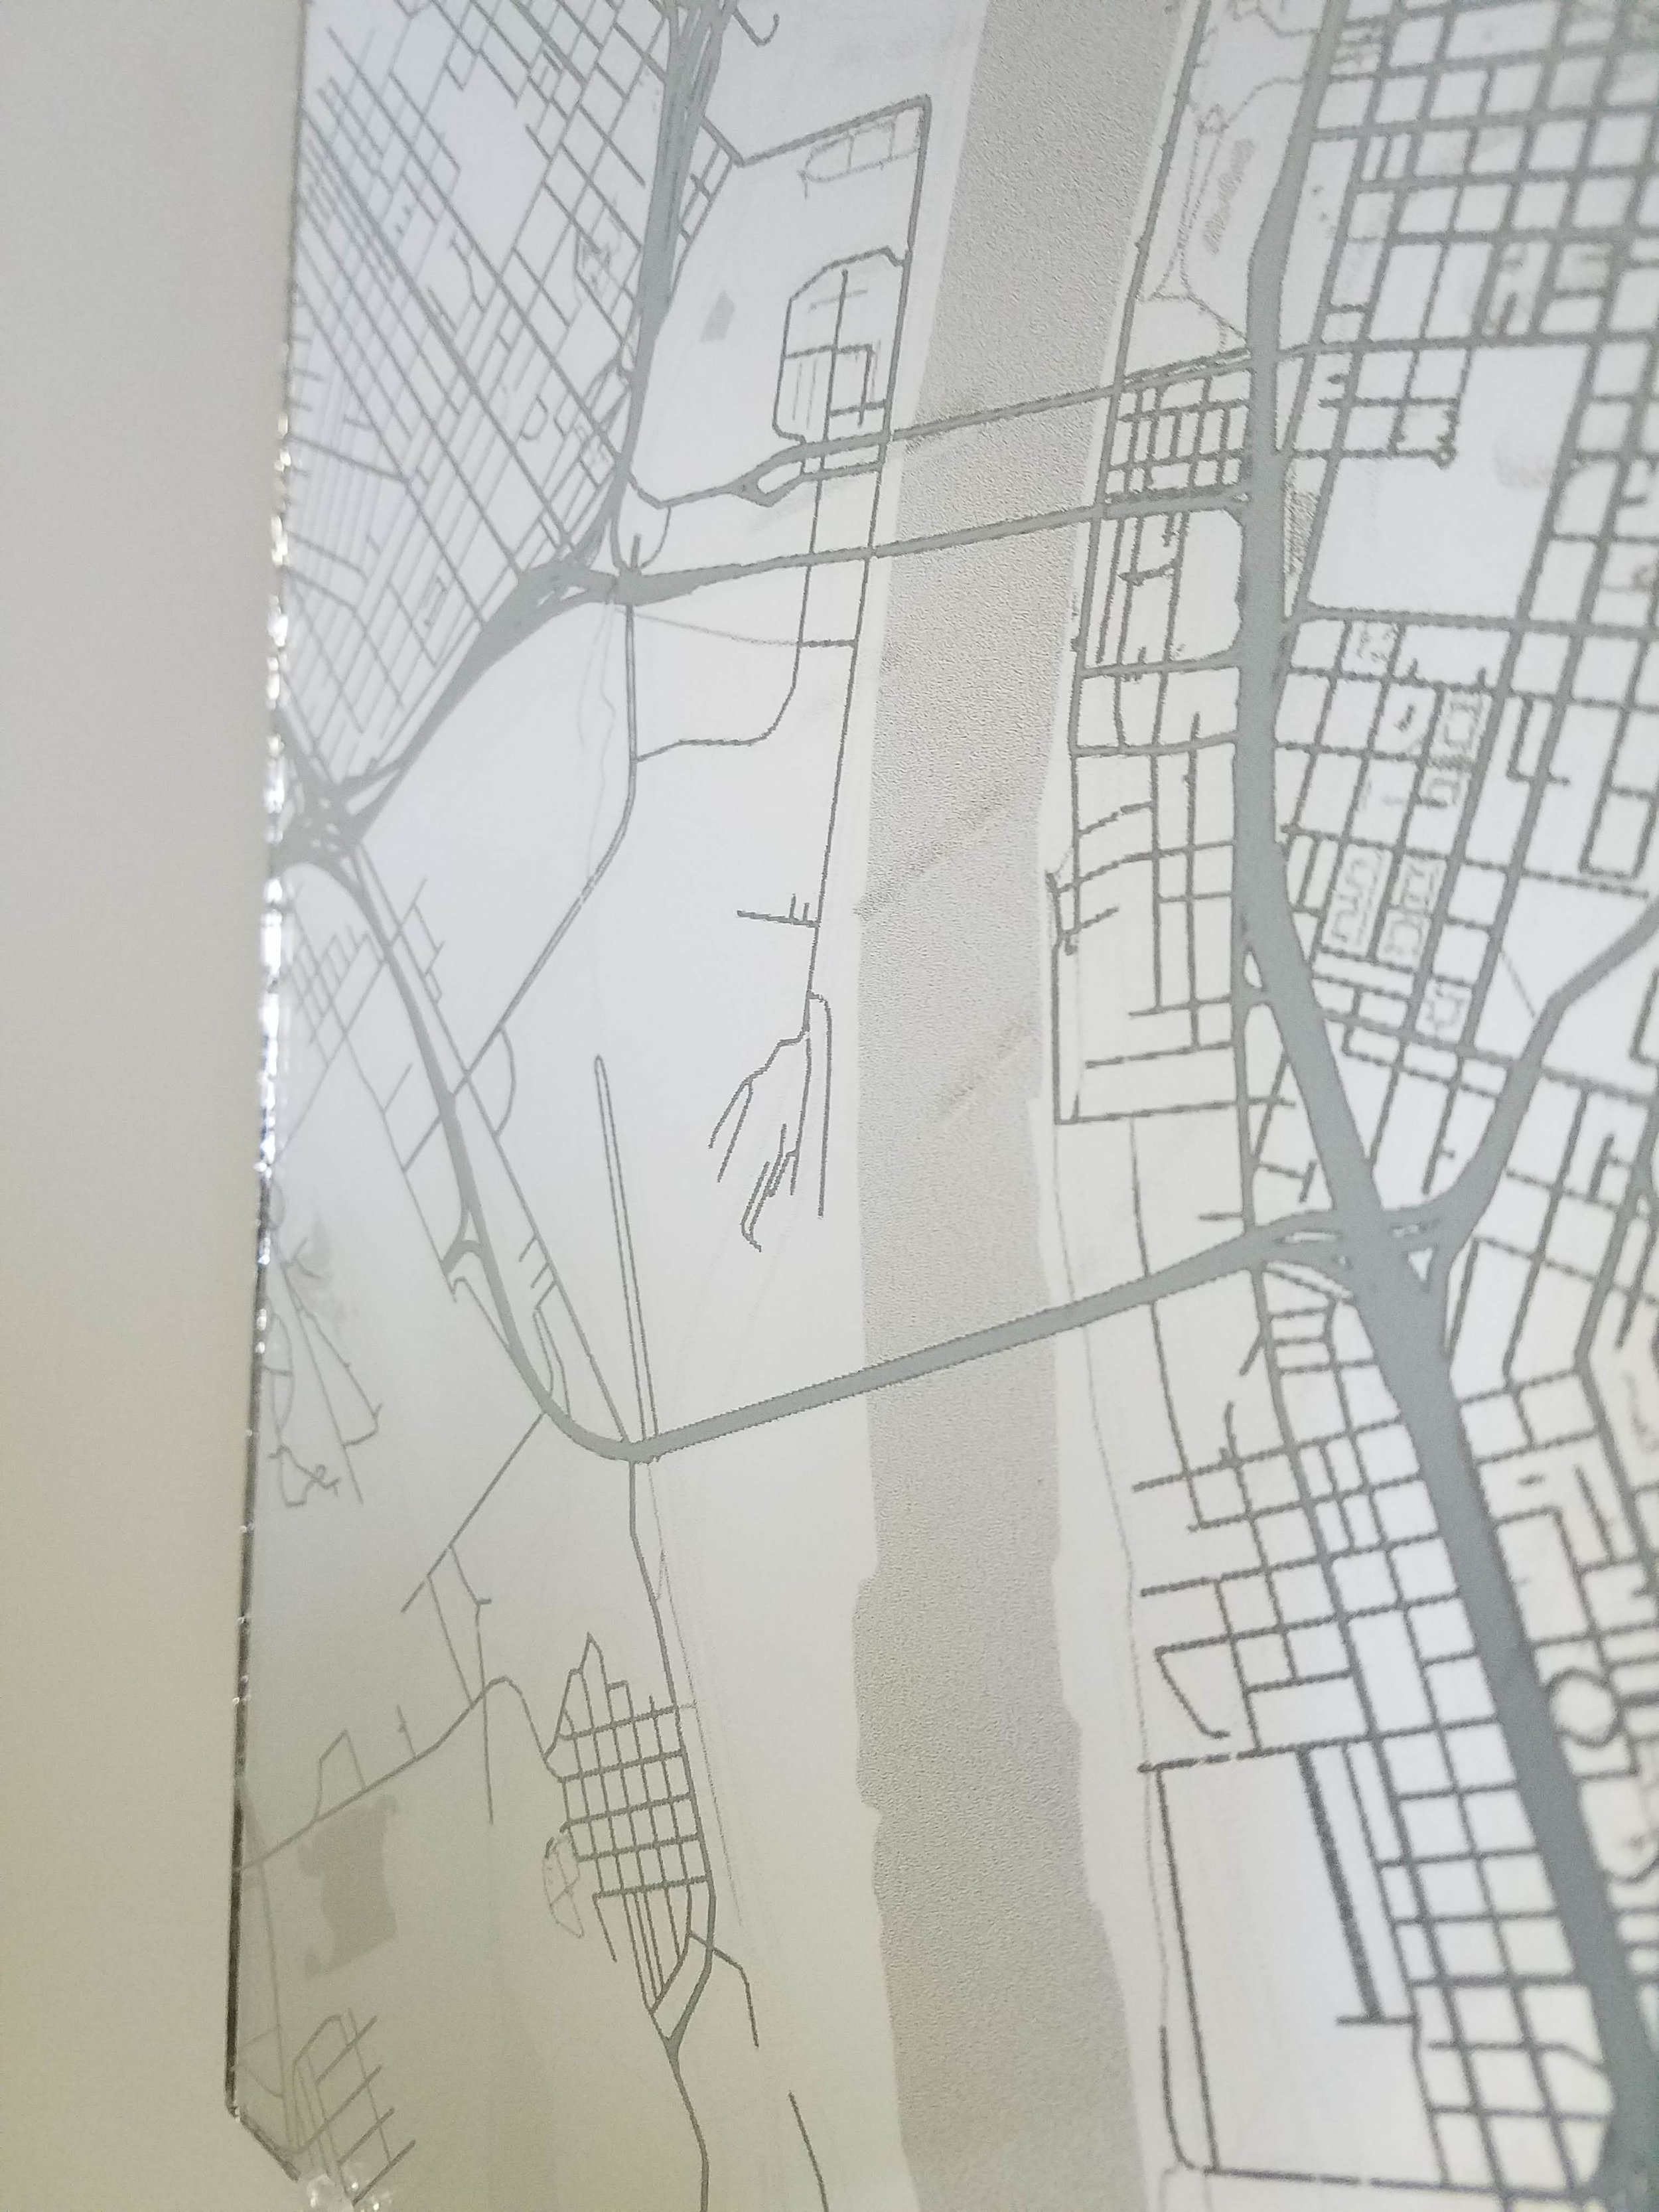 Digital Map on Mirror Close Up.jpg